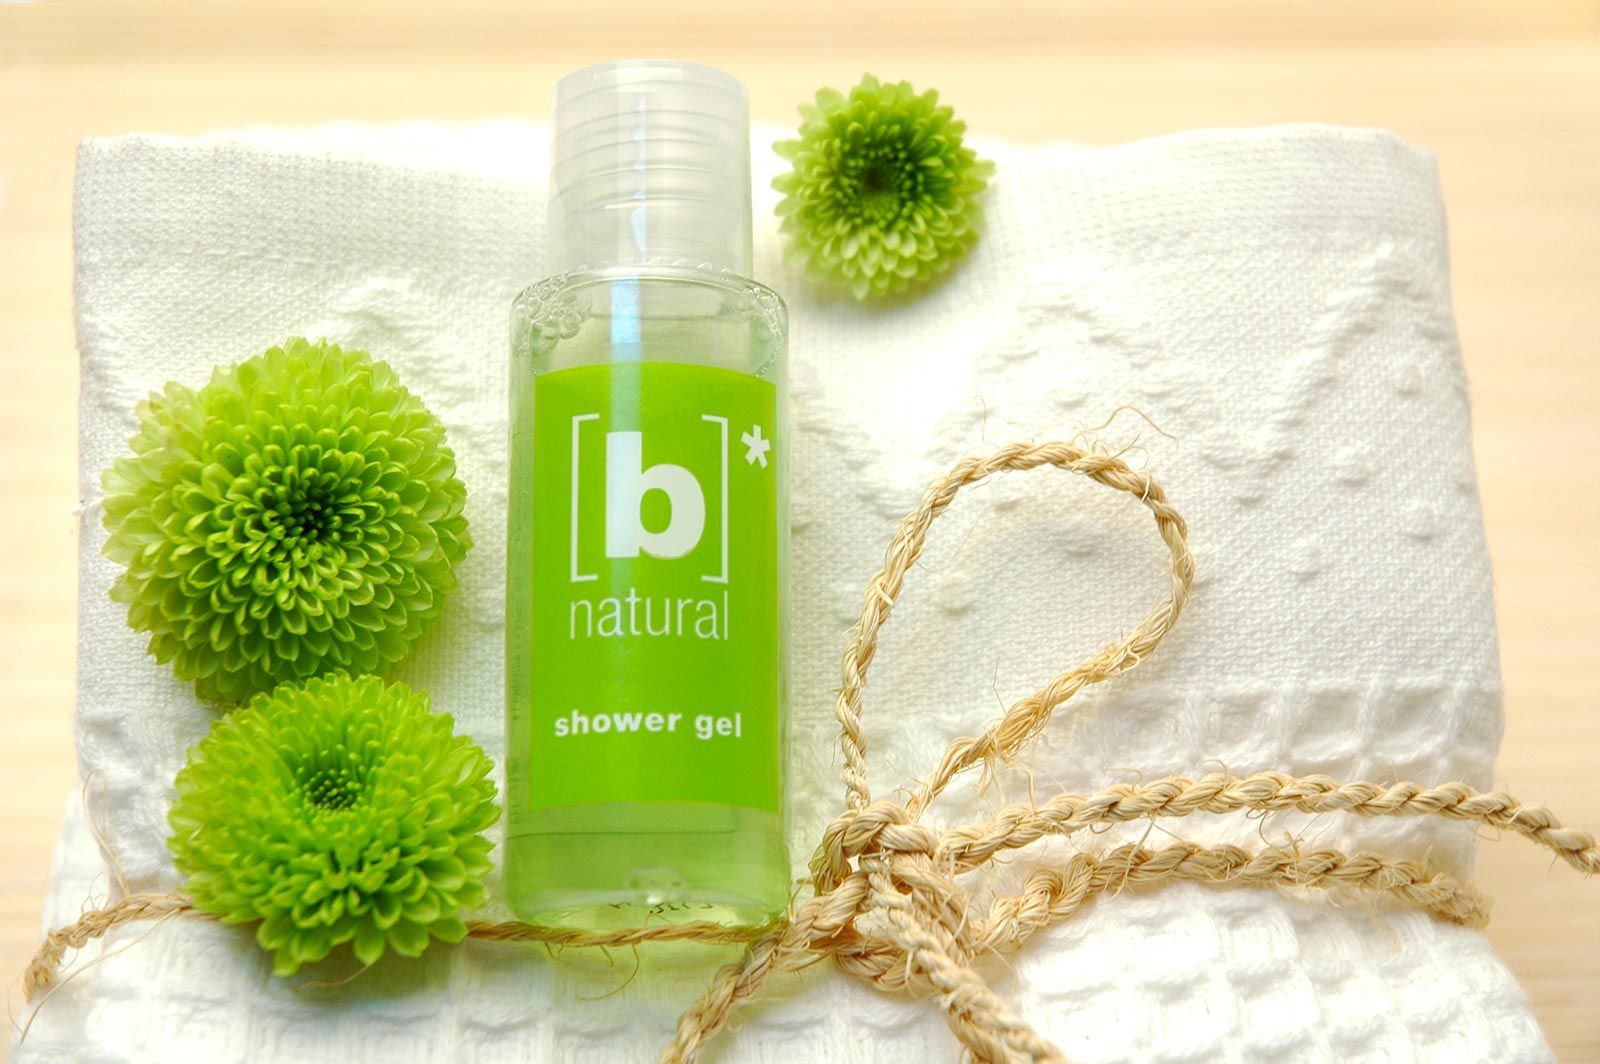 B natural: the Ecolabel certified amenities line! www.allegriniamenities.com